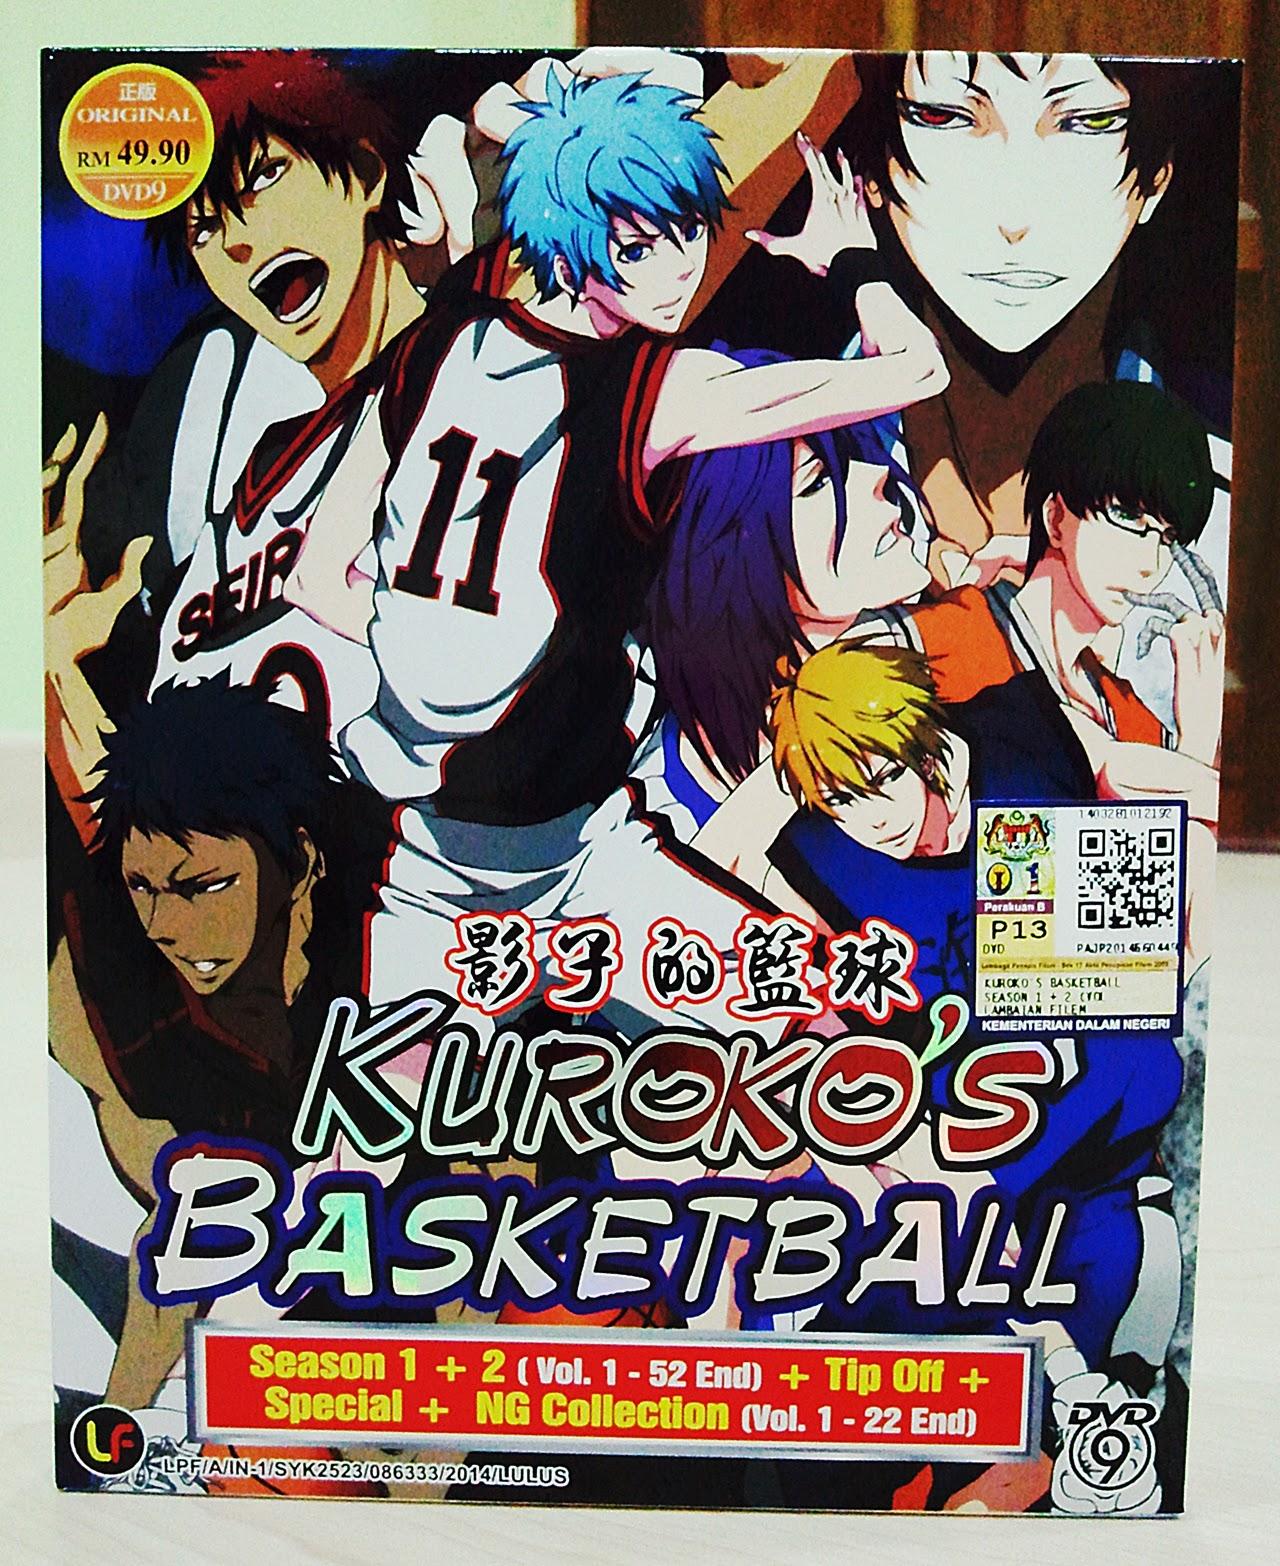 Manga Online Malaysia: [Malaysia] Buy Cheap Anime DVD, Manga, Books Etc